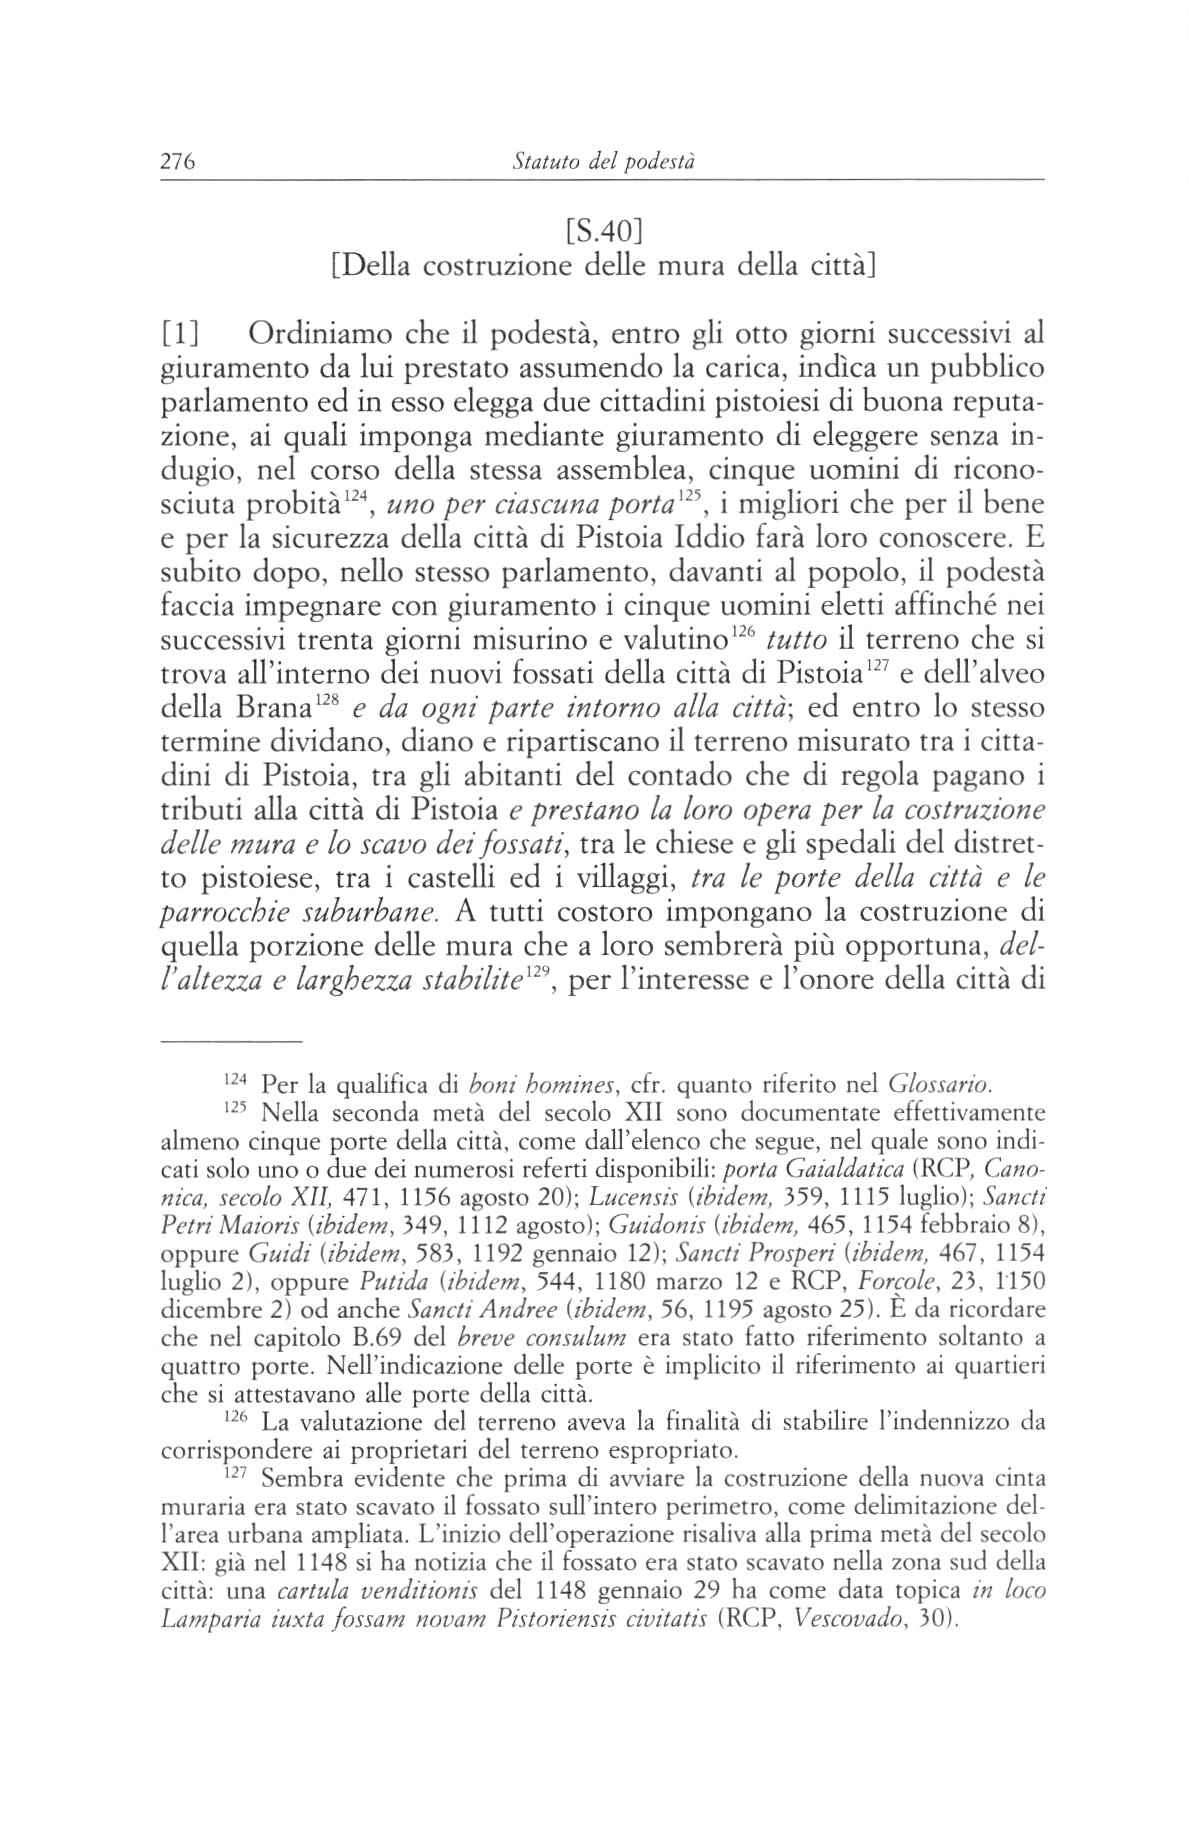 statuti pistoiesi del sec.XII 0276.jpg